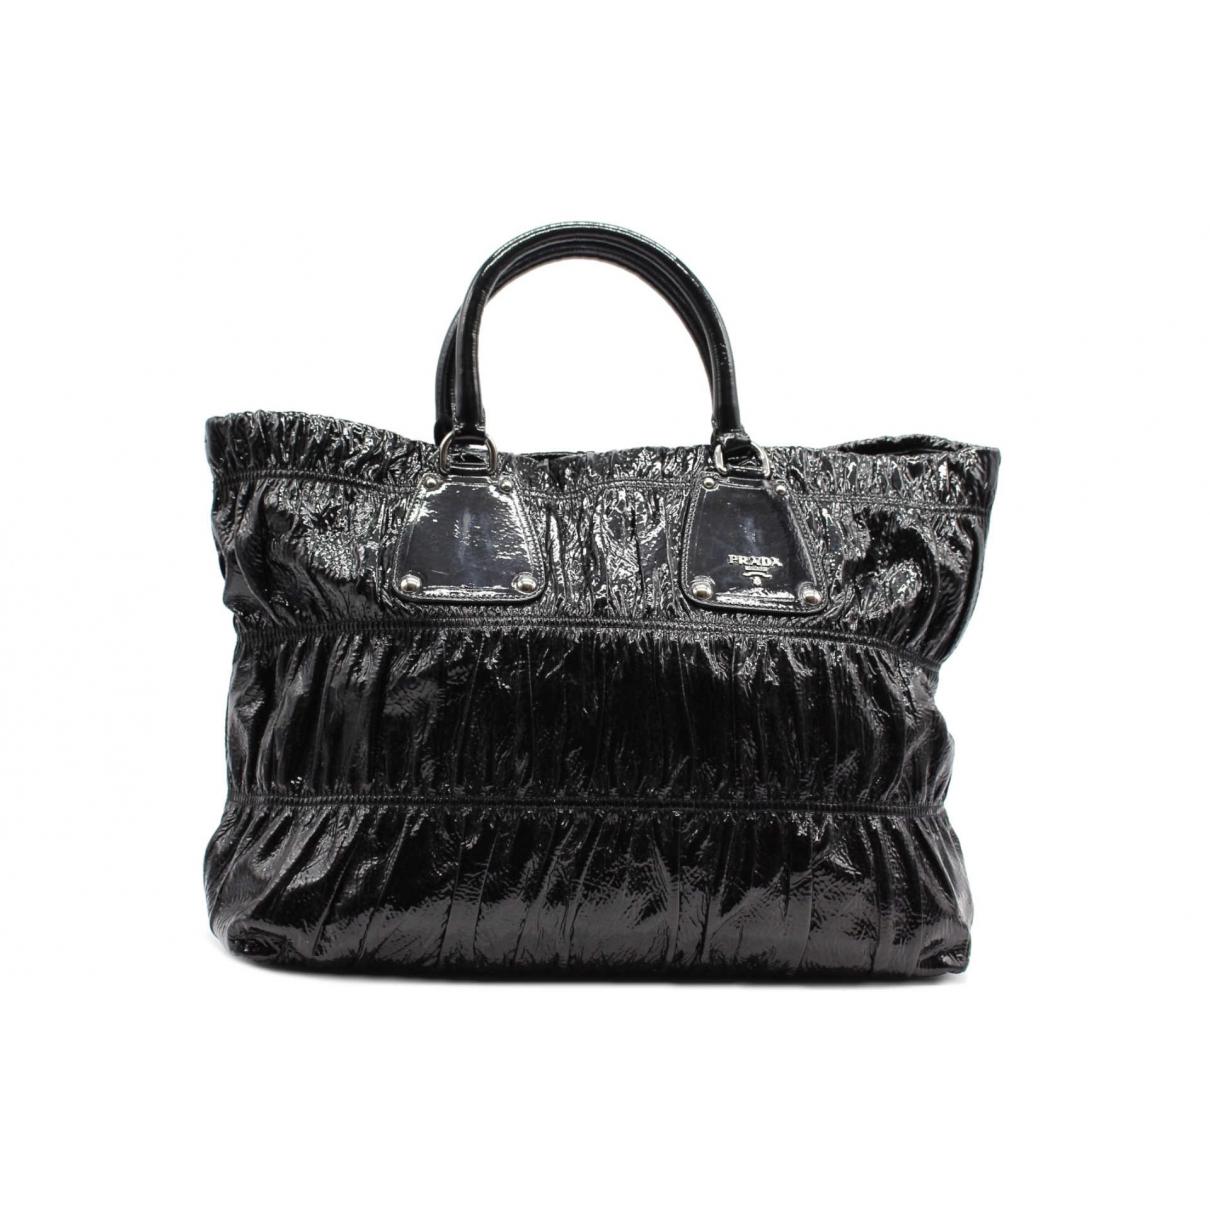 Prada N Black Patent leather handbag for Women N